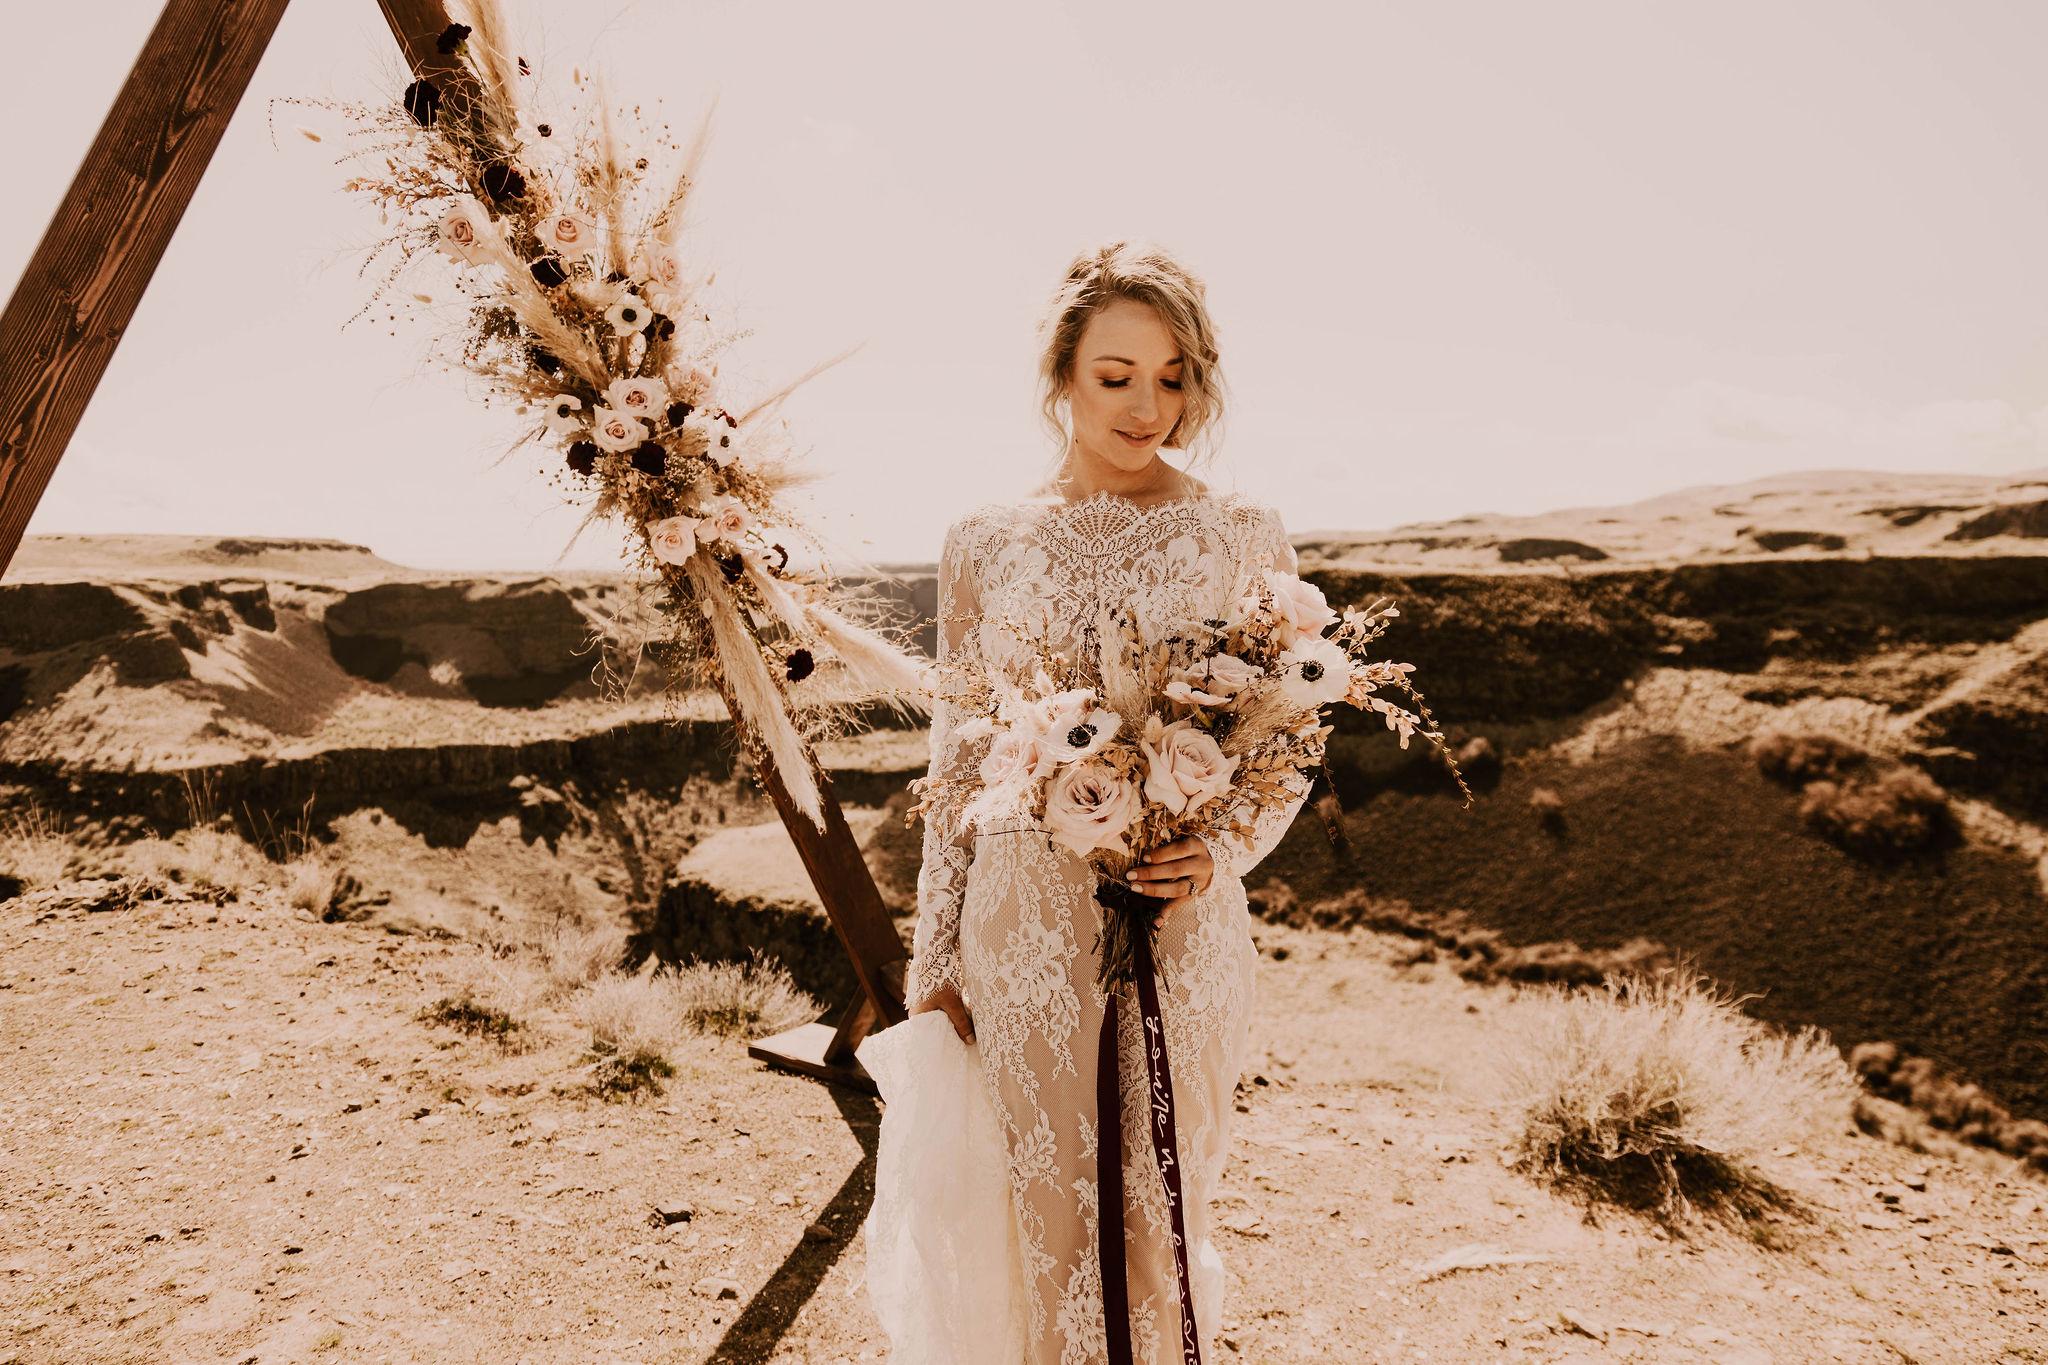 spokane bride summer wedding bouquet